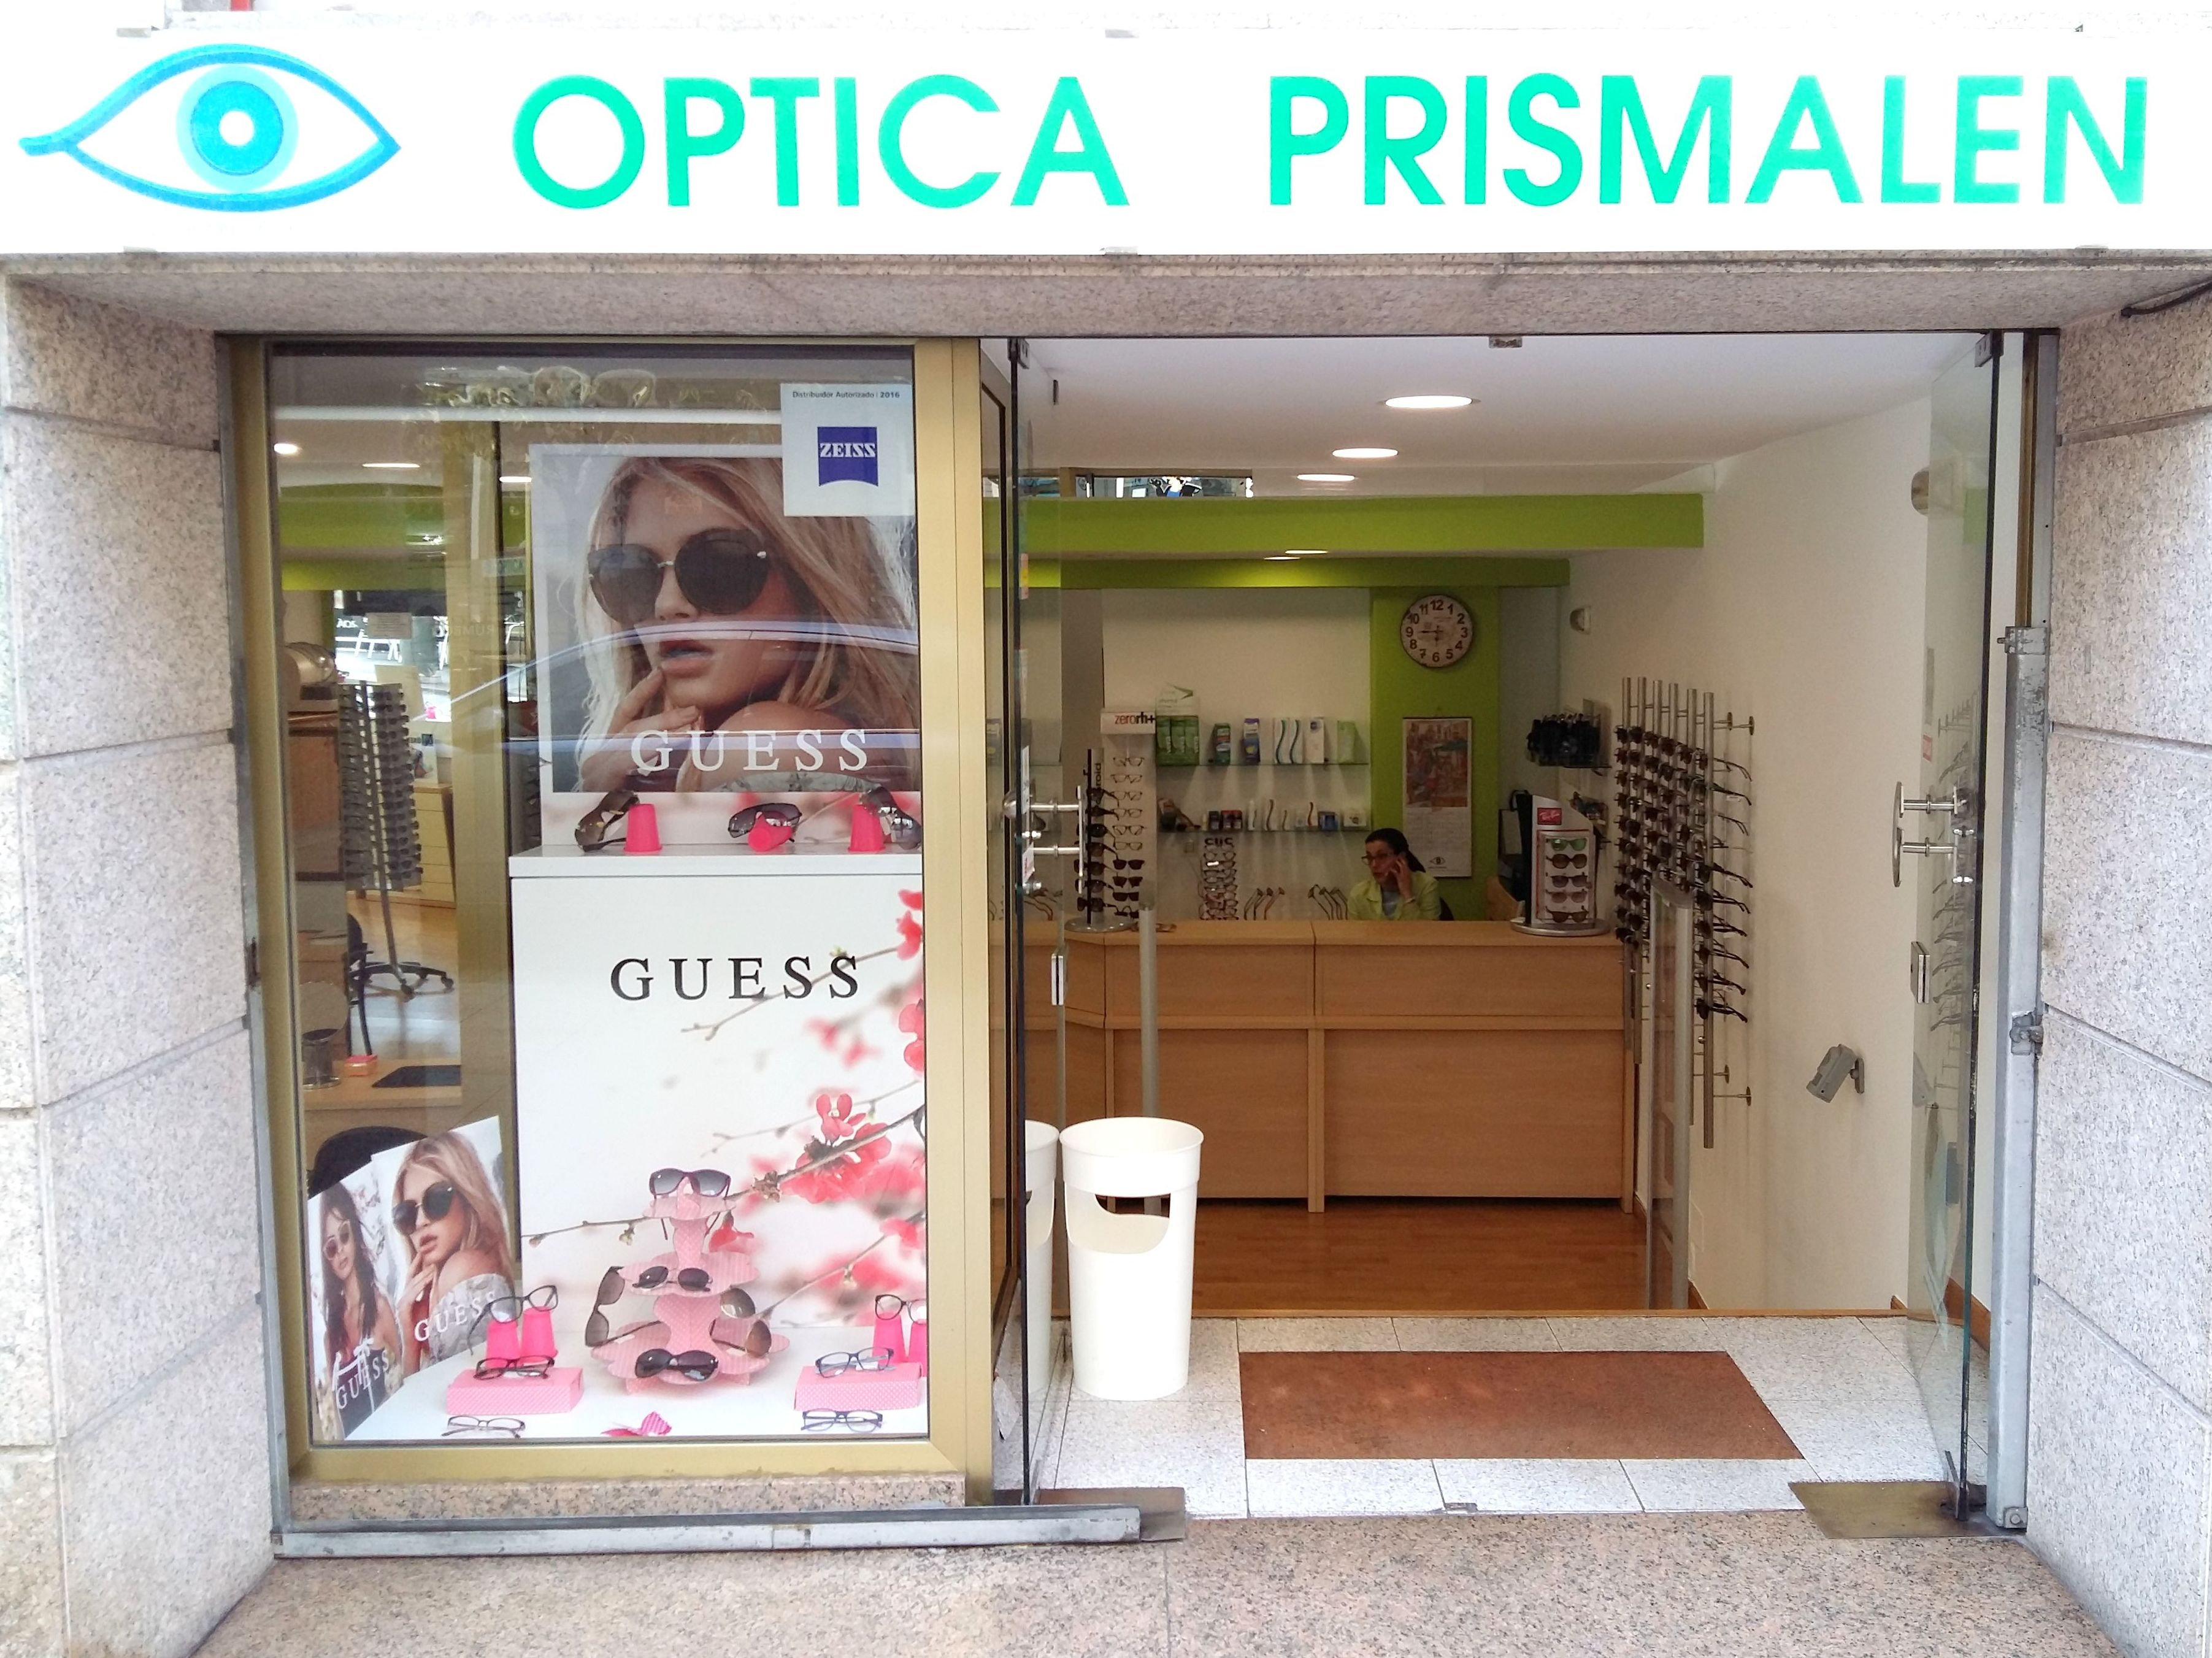 Foto 1 de Ópticas en Vigo | ÓPTICA PRISMALEN             Nº reg. sanitario: E-36-000 230